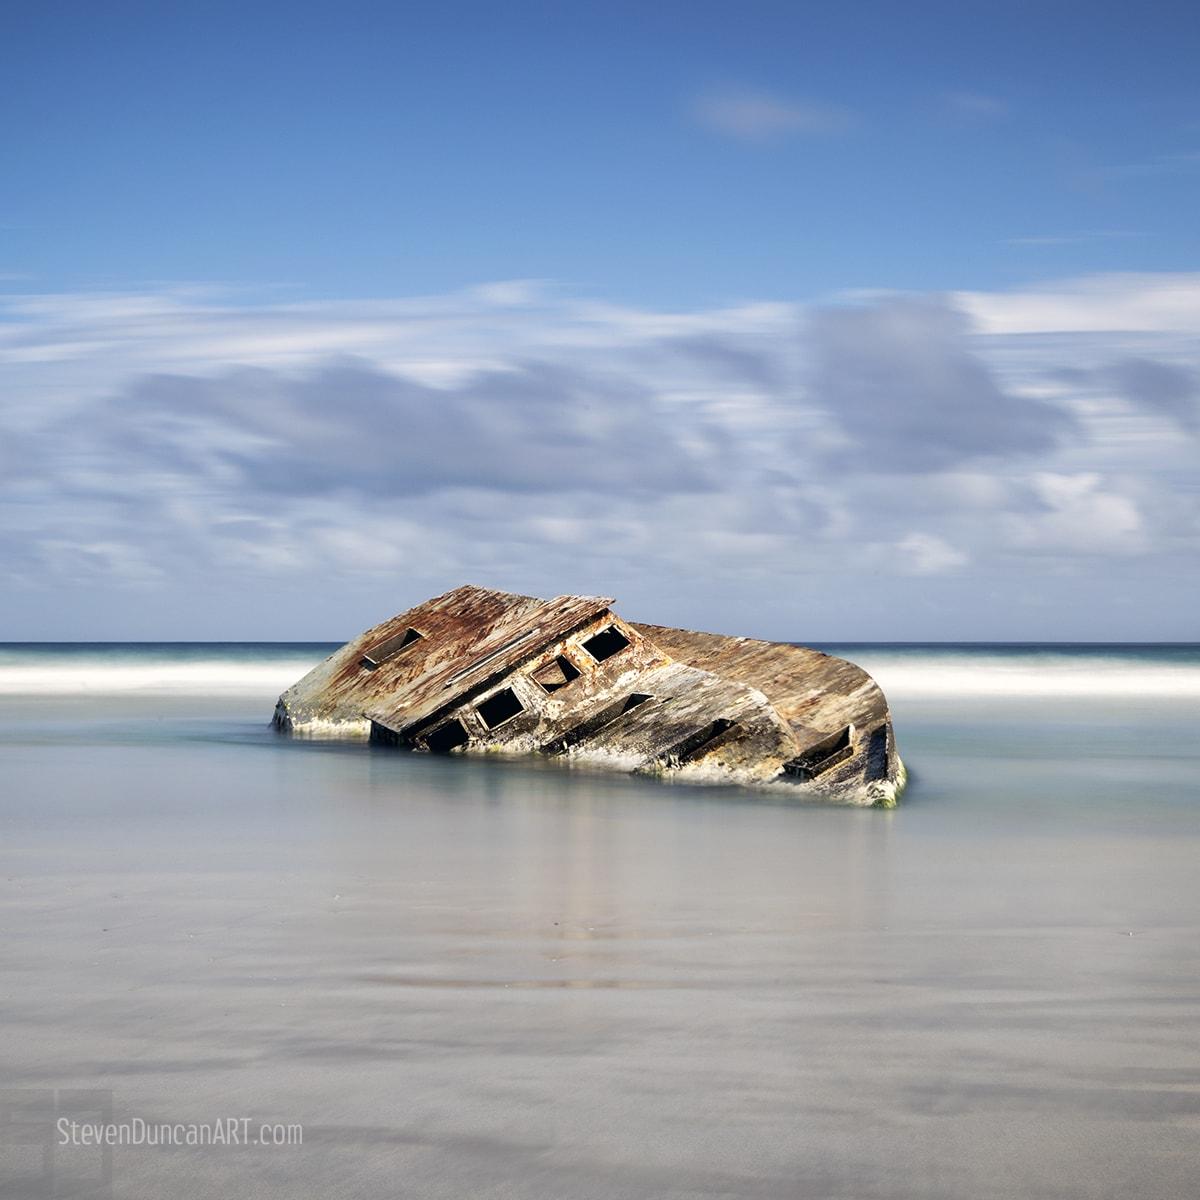 Cape Banks Shipwreck